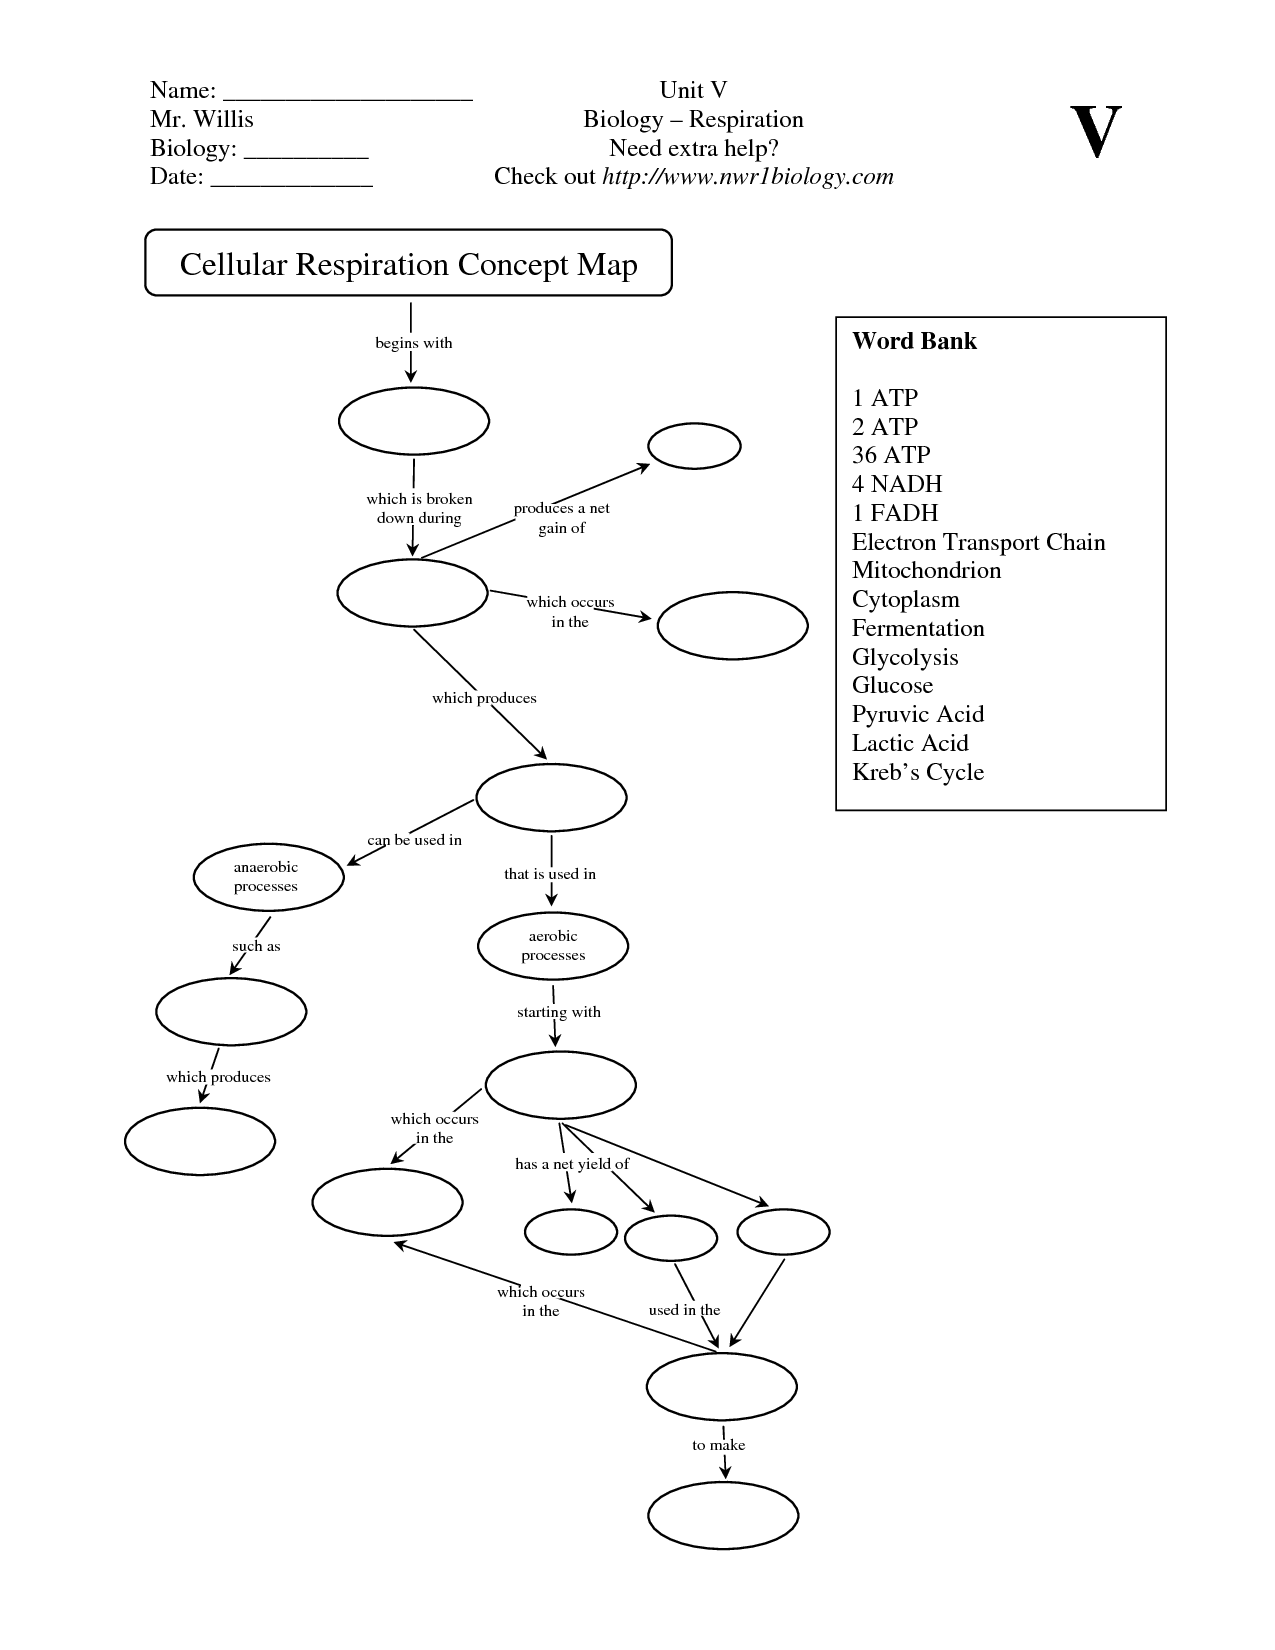 Cellular respiration diagram worksheet answers